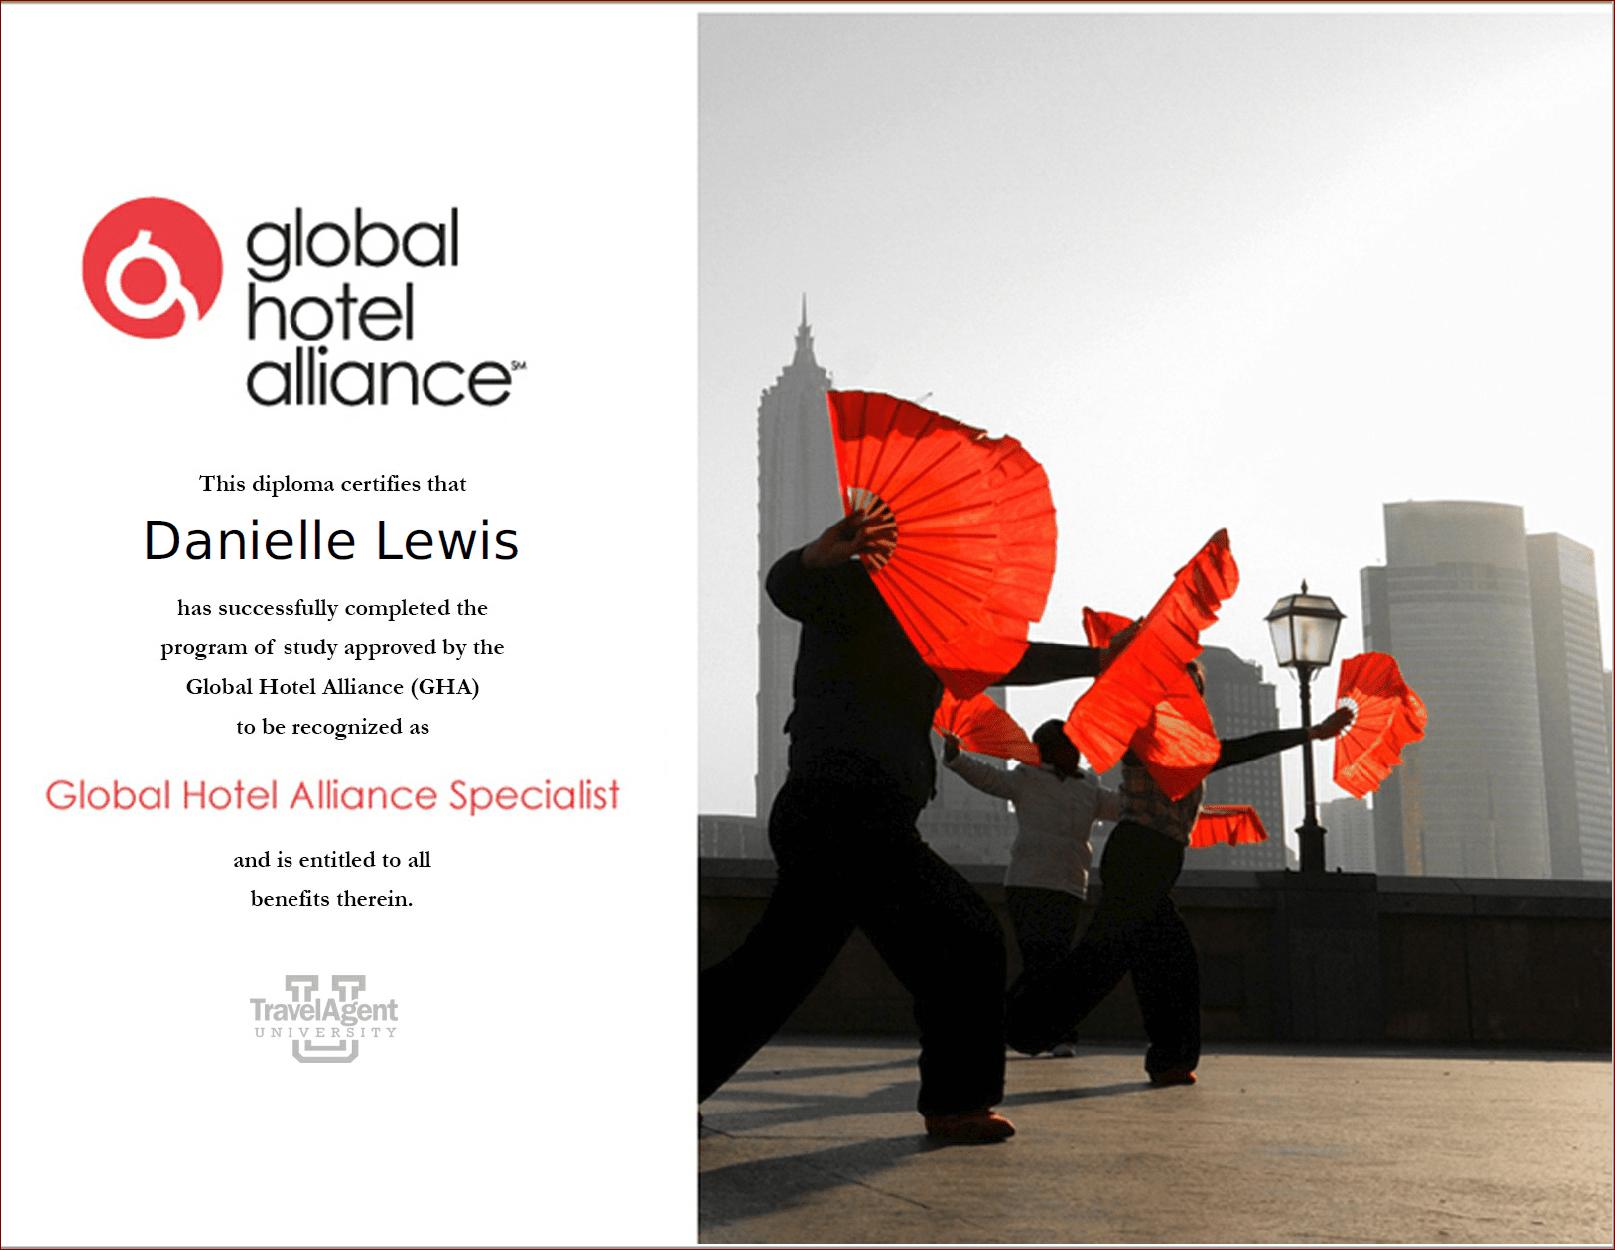 SelfishMe Travel - Global Hotel Alliance (GHA) Specialist Certificate